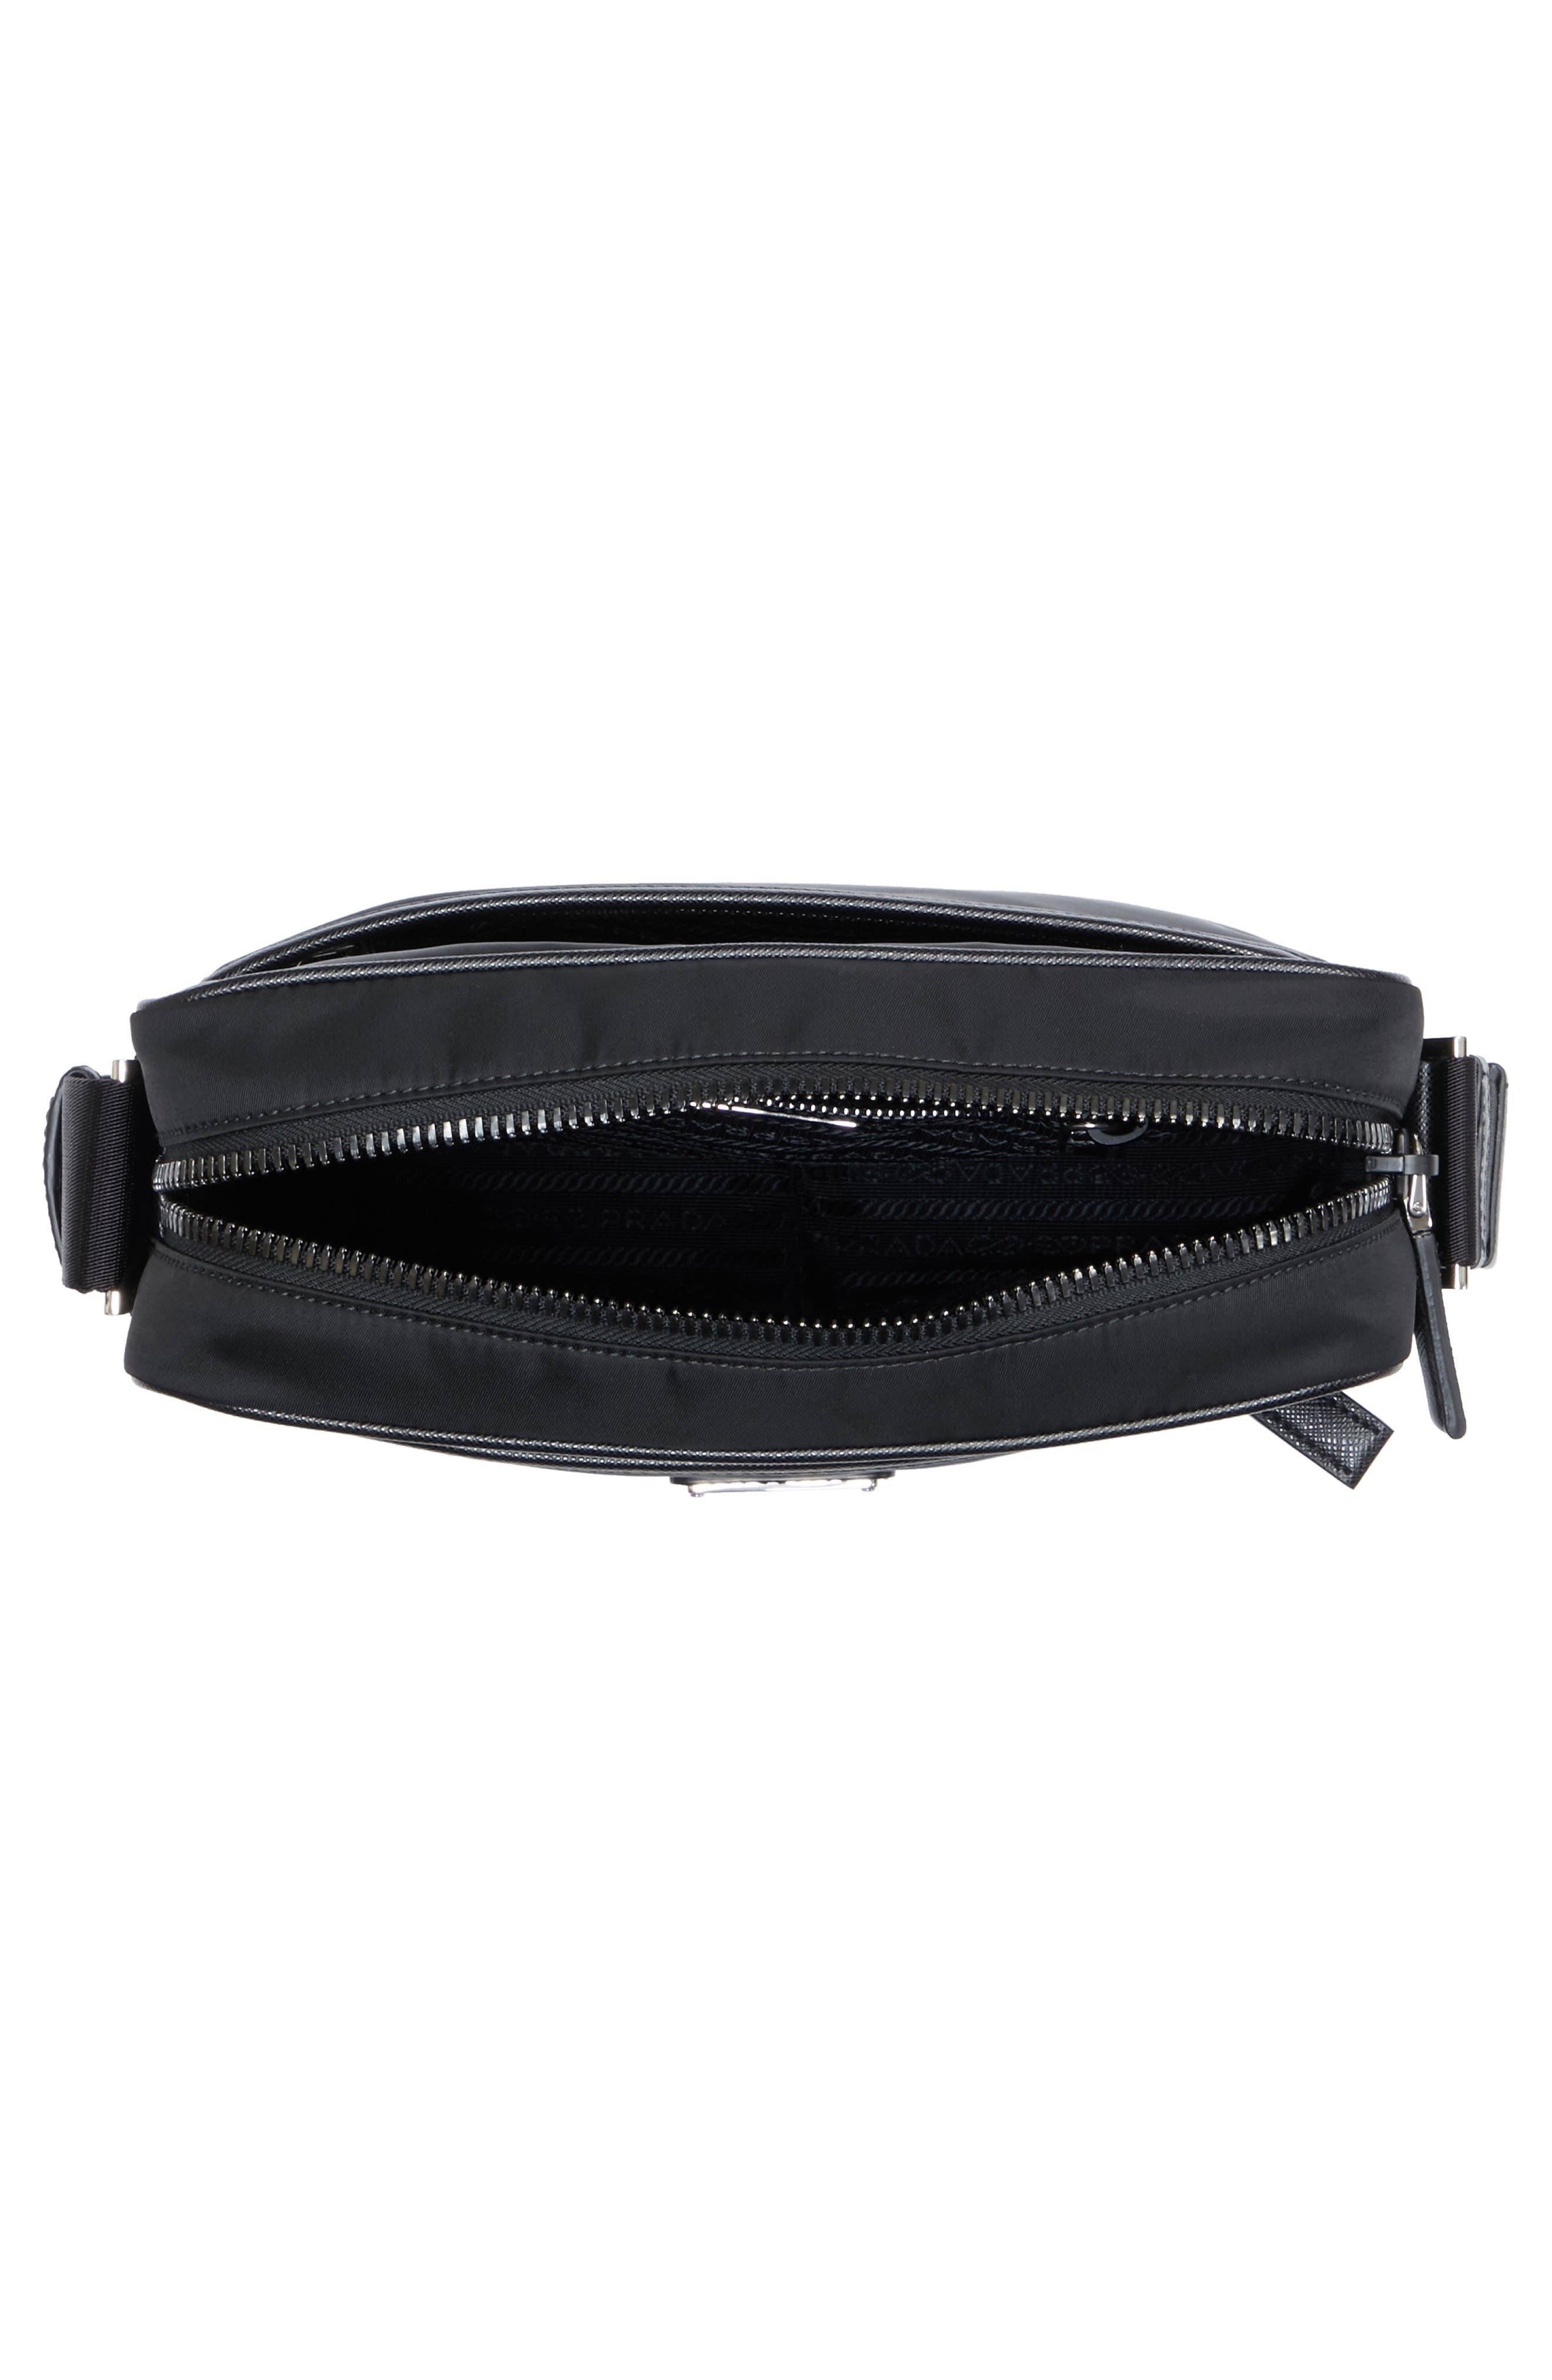 Saffiano Leather Crossbody Bag,                             Alternate thumbnail 4, color,                             001